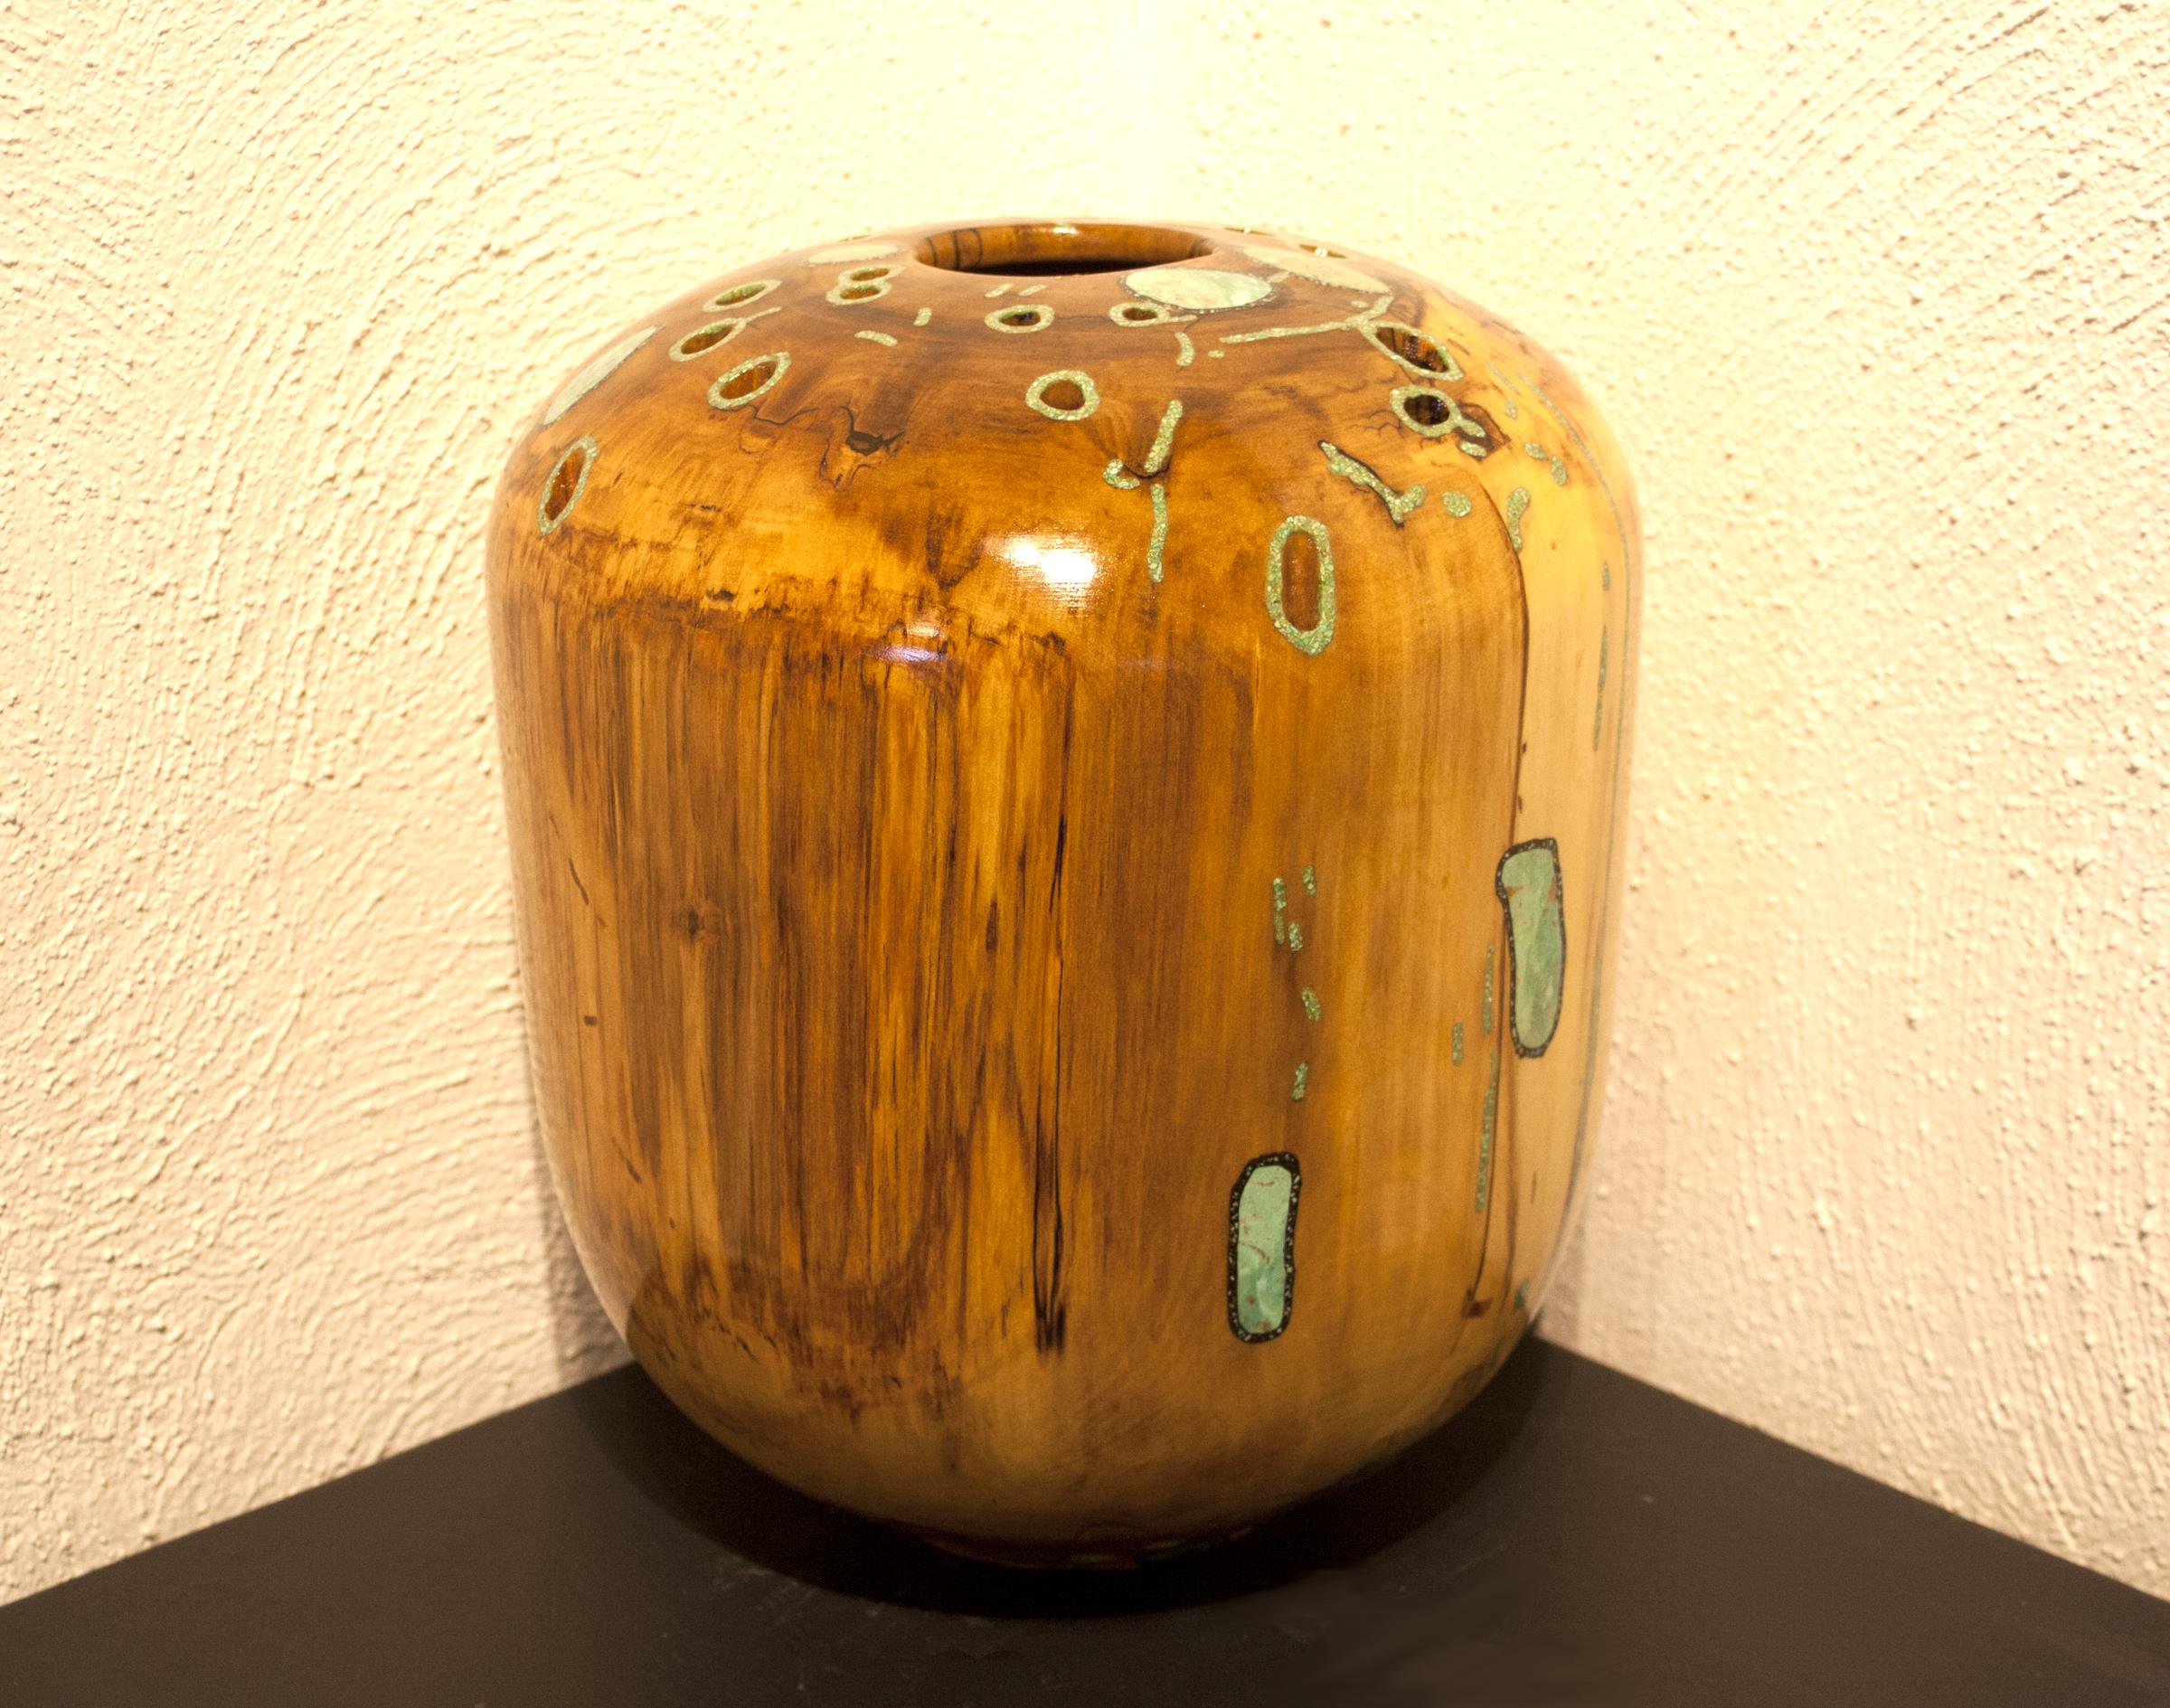 #1766 Aspencraft Vase